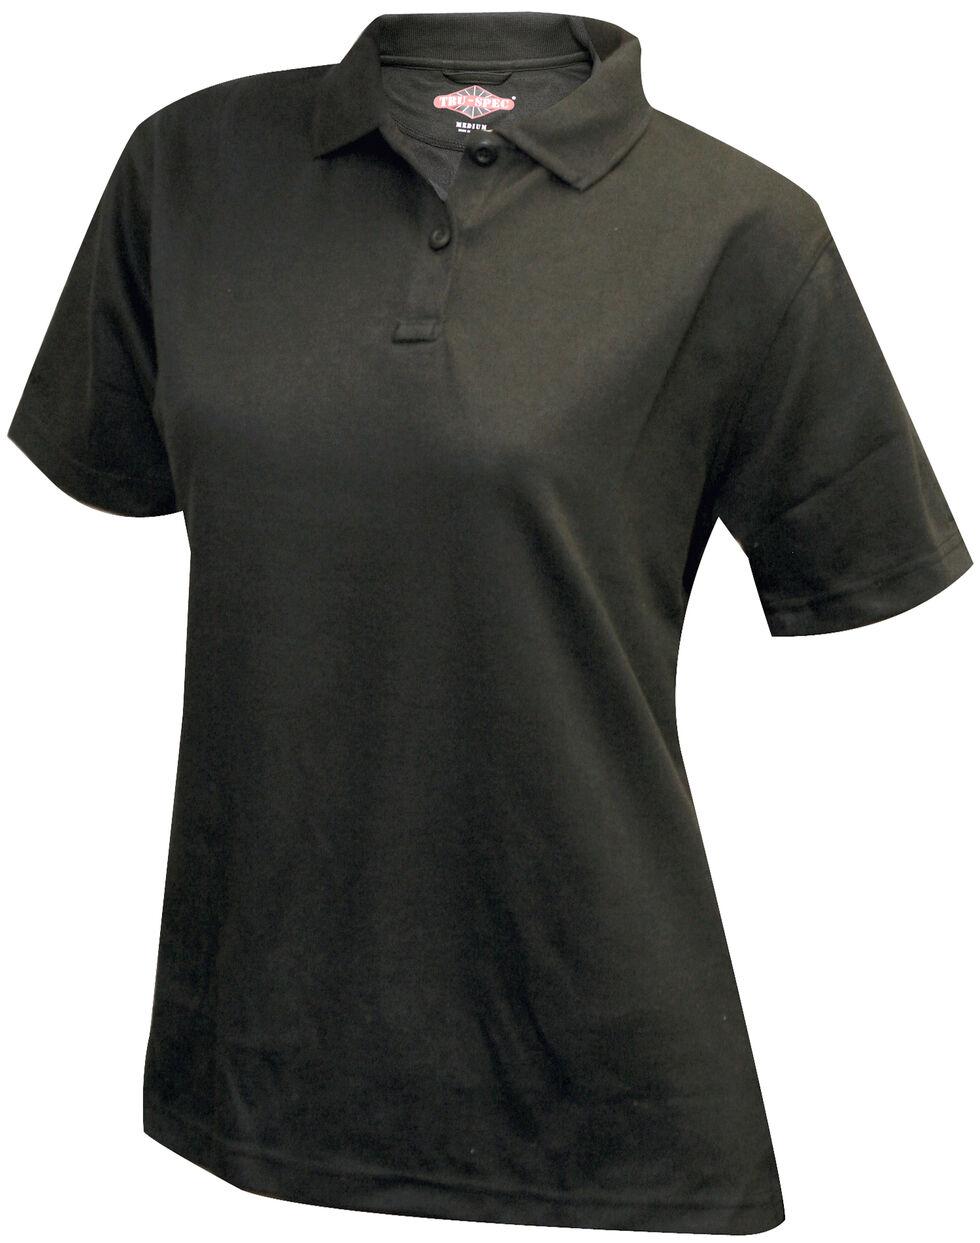 Tru-Spec Women's 24-7 Short Sleeve Performance Polo Shirt - Extra Large Sizes, Black, hi-res